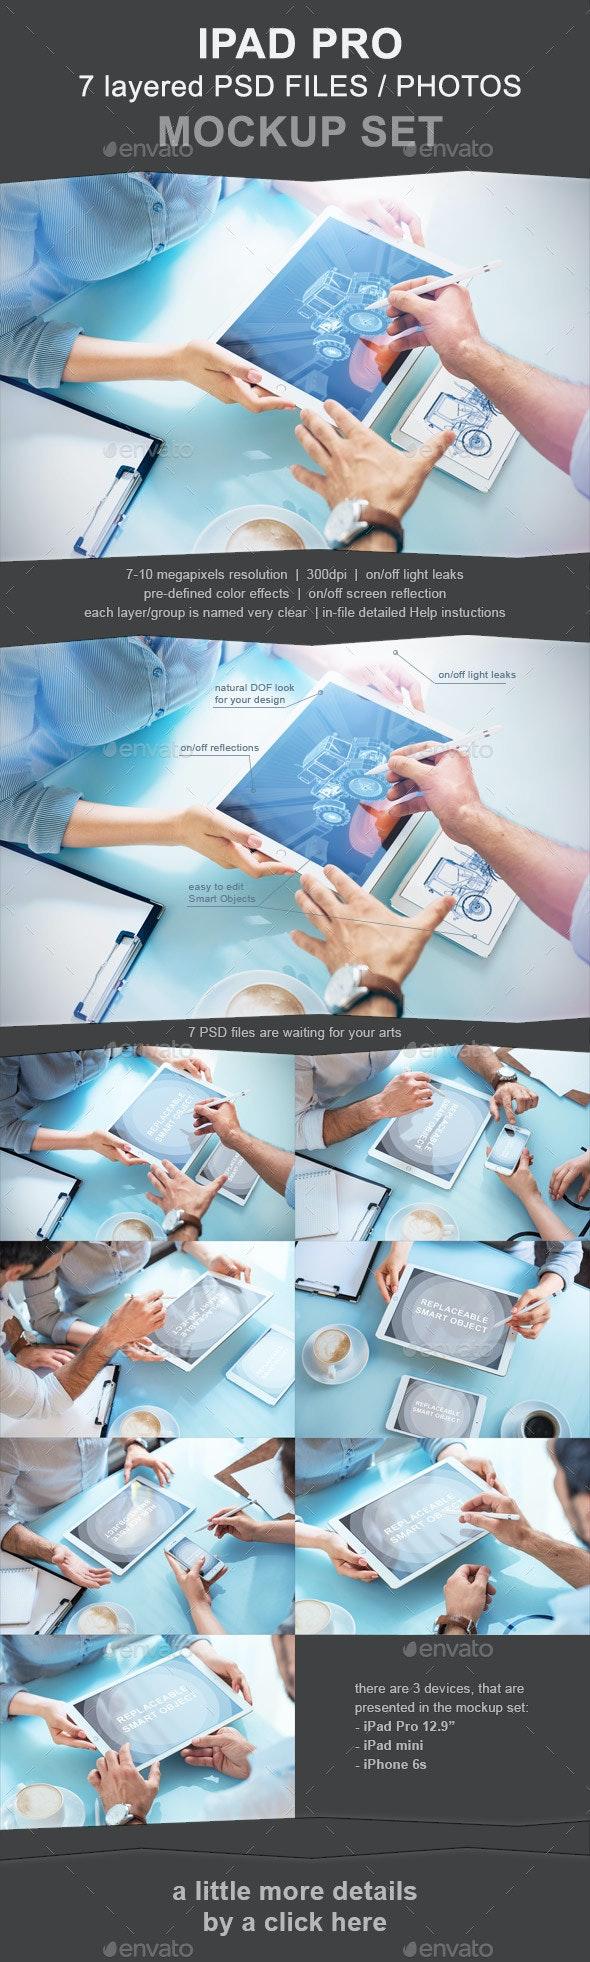 iPad Pro Photo Mockup Set - 7 PSD - Mobile Displays